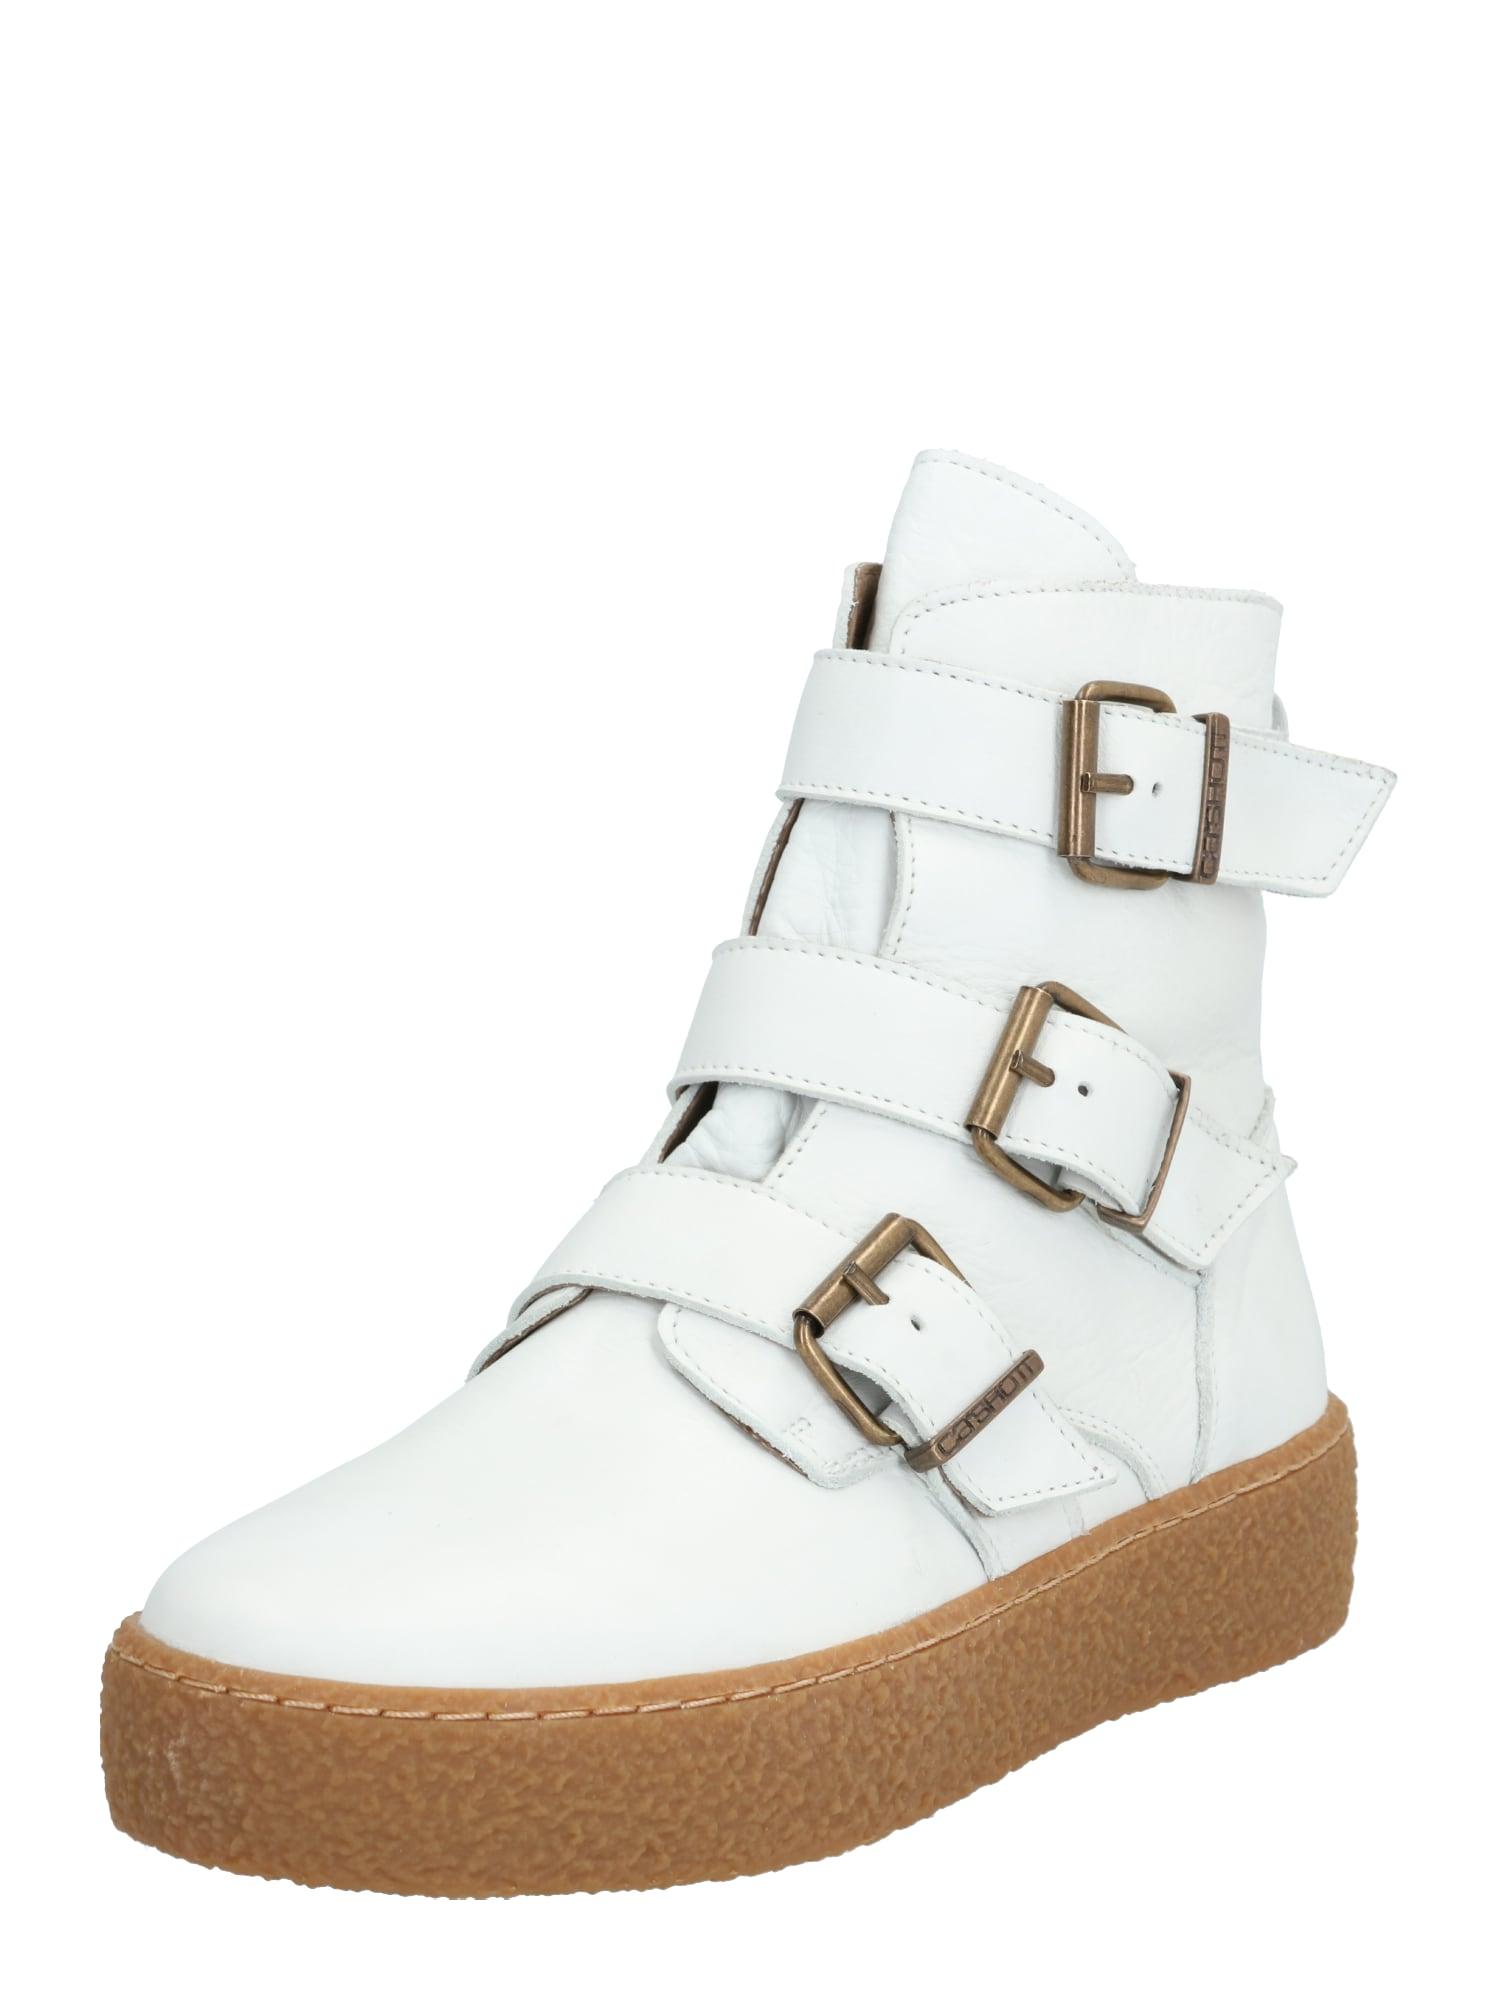 Ca Shott Auliniai batai juoda / balta